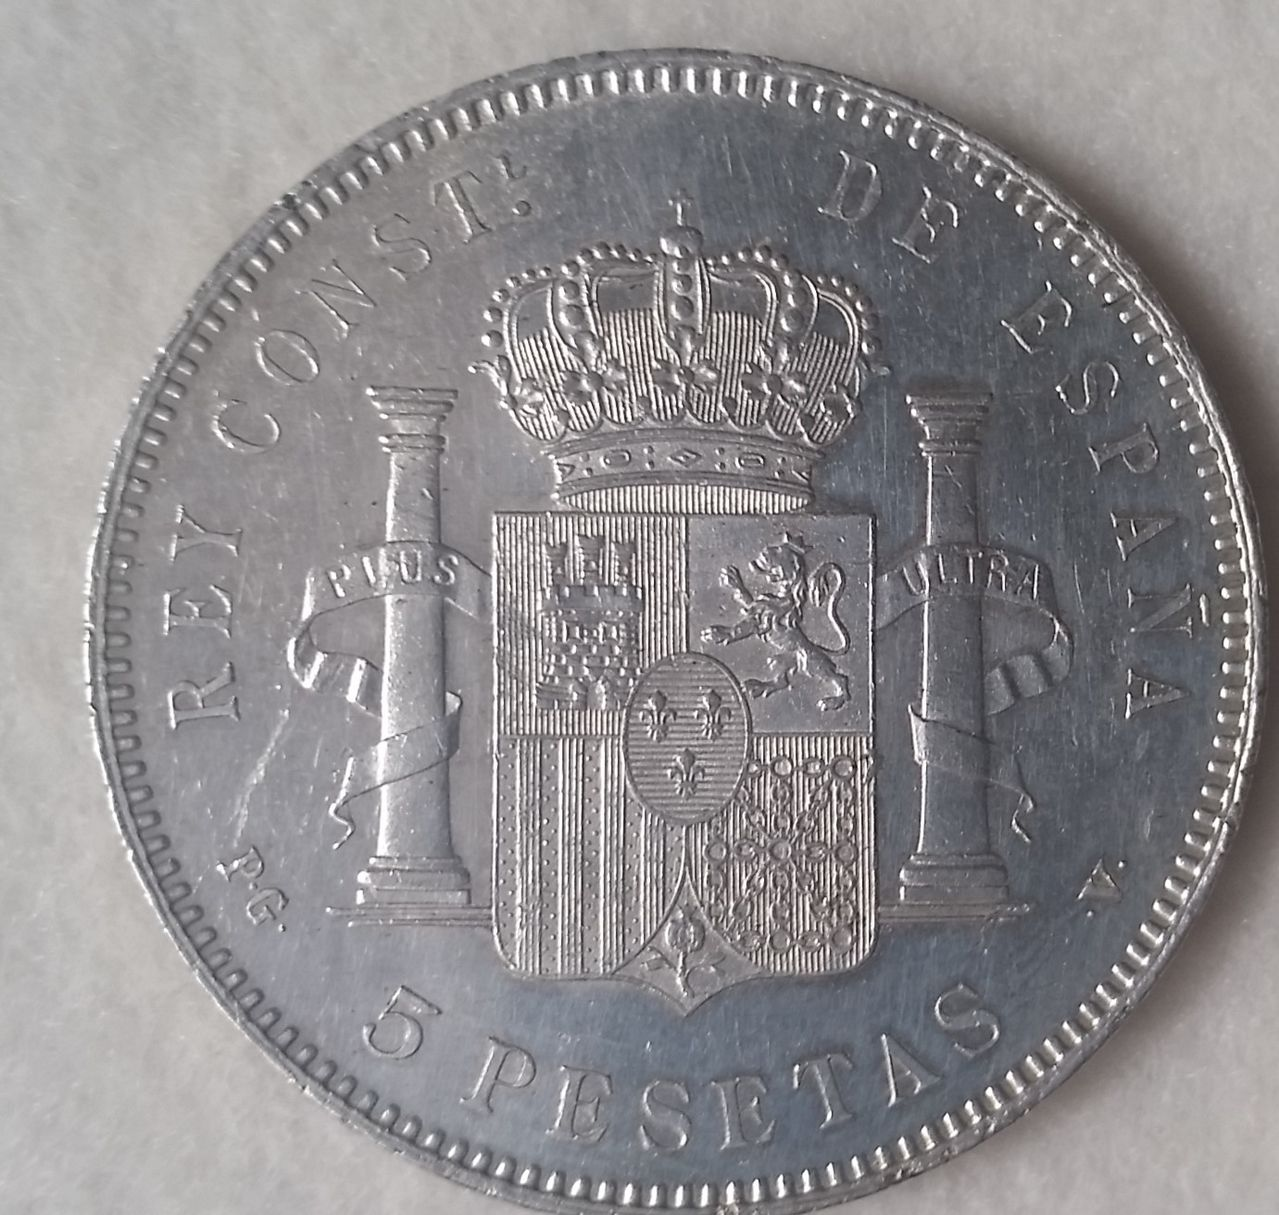 ALFONSO XIII. 5 pesetas. 1896*18-96. PGV 20160402_180009